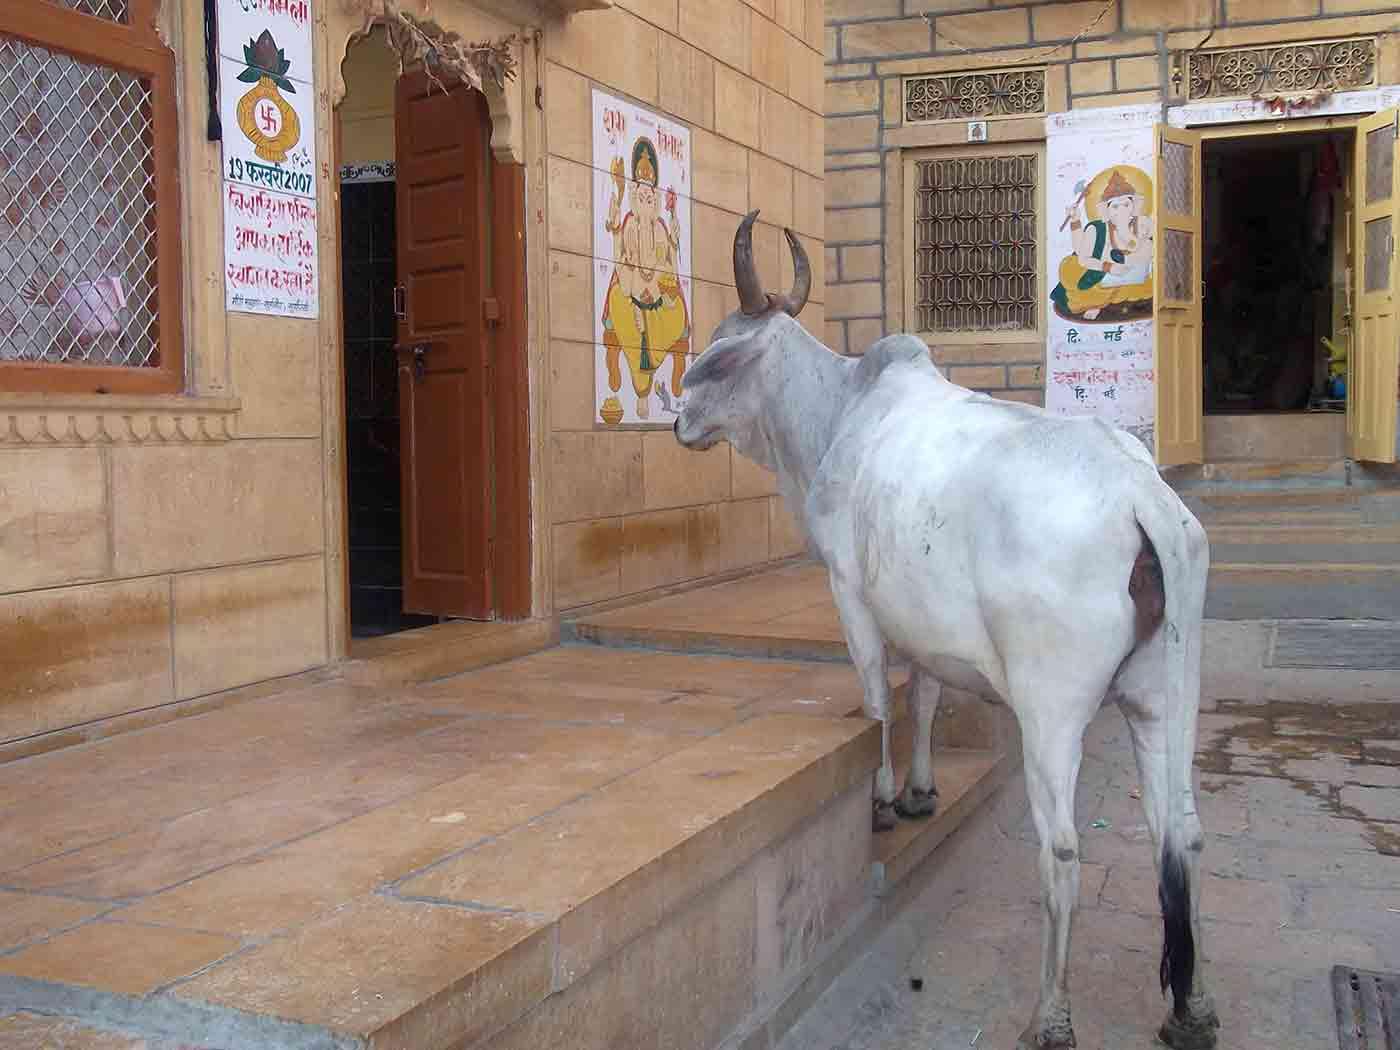 Vaca queriendo entrar en casa Jaisalmer